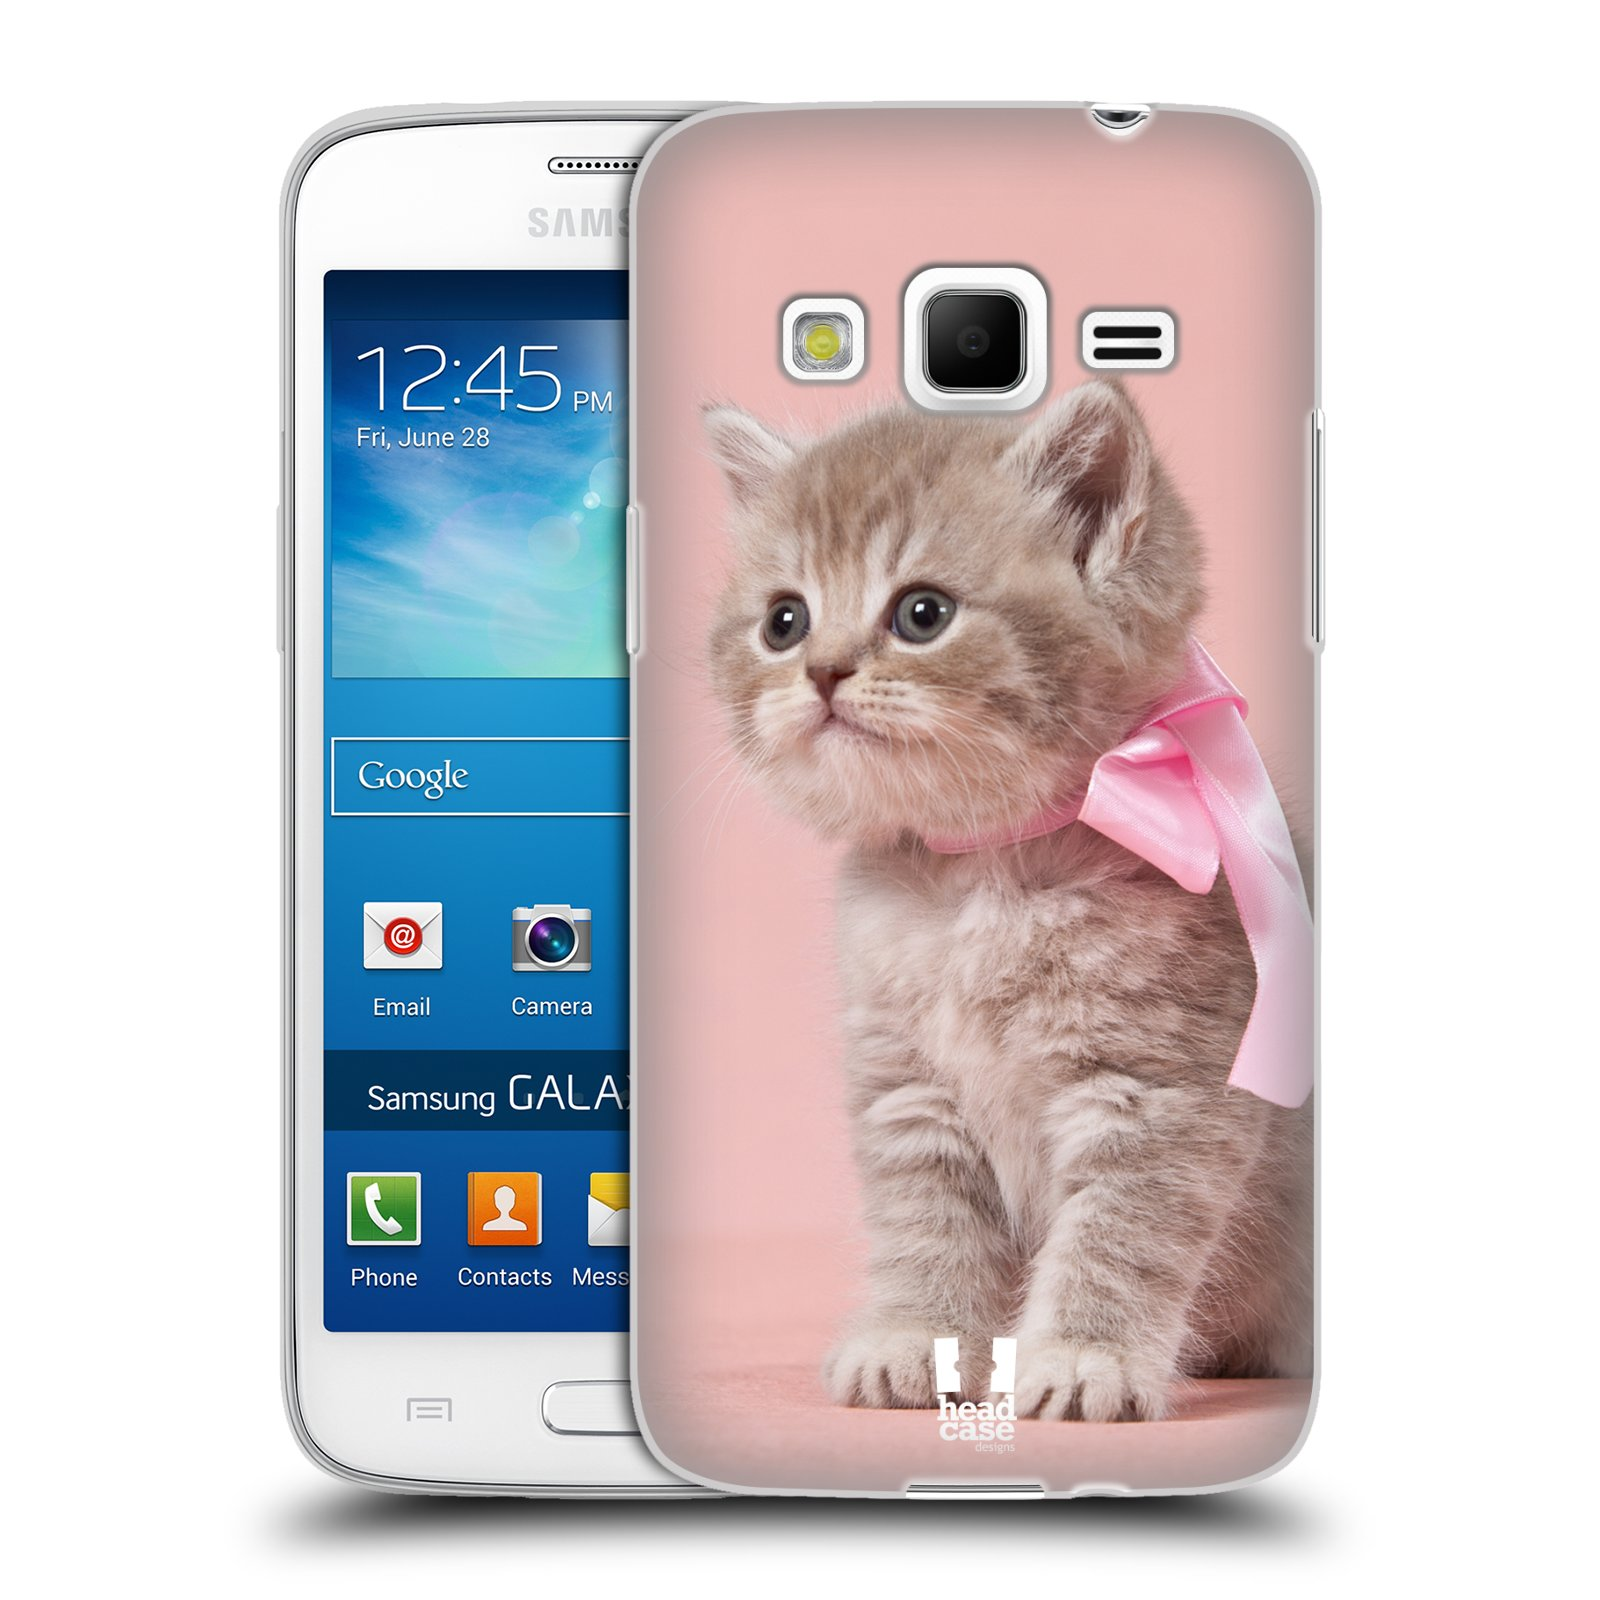 Silikonové pouzdro na mobil Samsung Galaxy Express 2 HEAD CASE KOTĚ S MAŠLÍ (Silikonový kryt či obal na mobilní telefon Samsung Galaxy Express 2 SM-G3815)